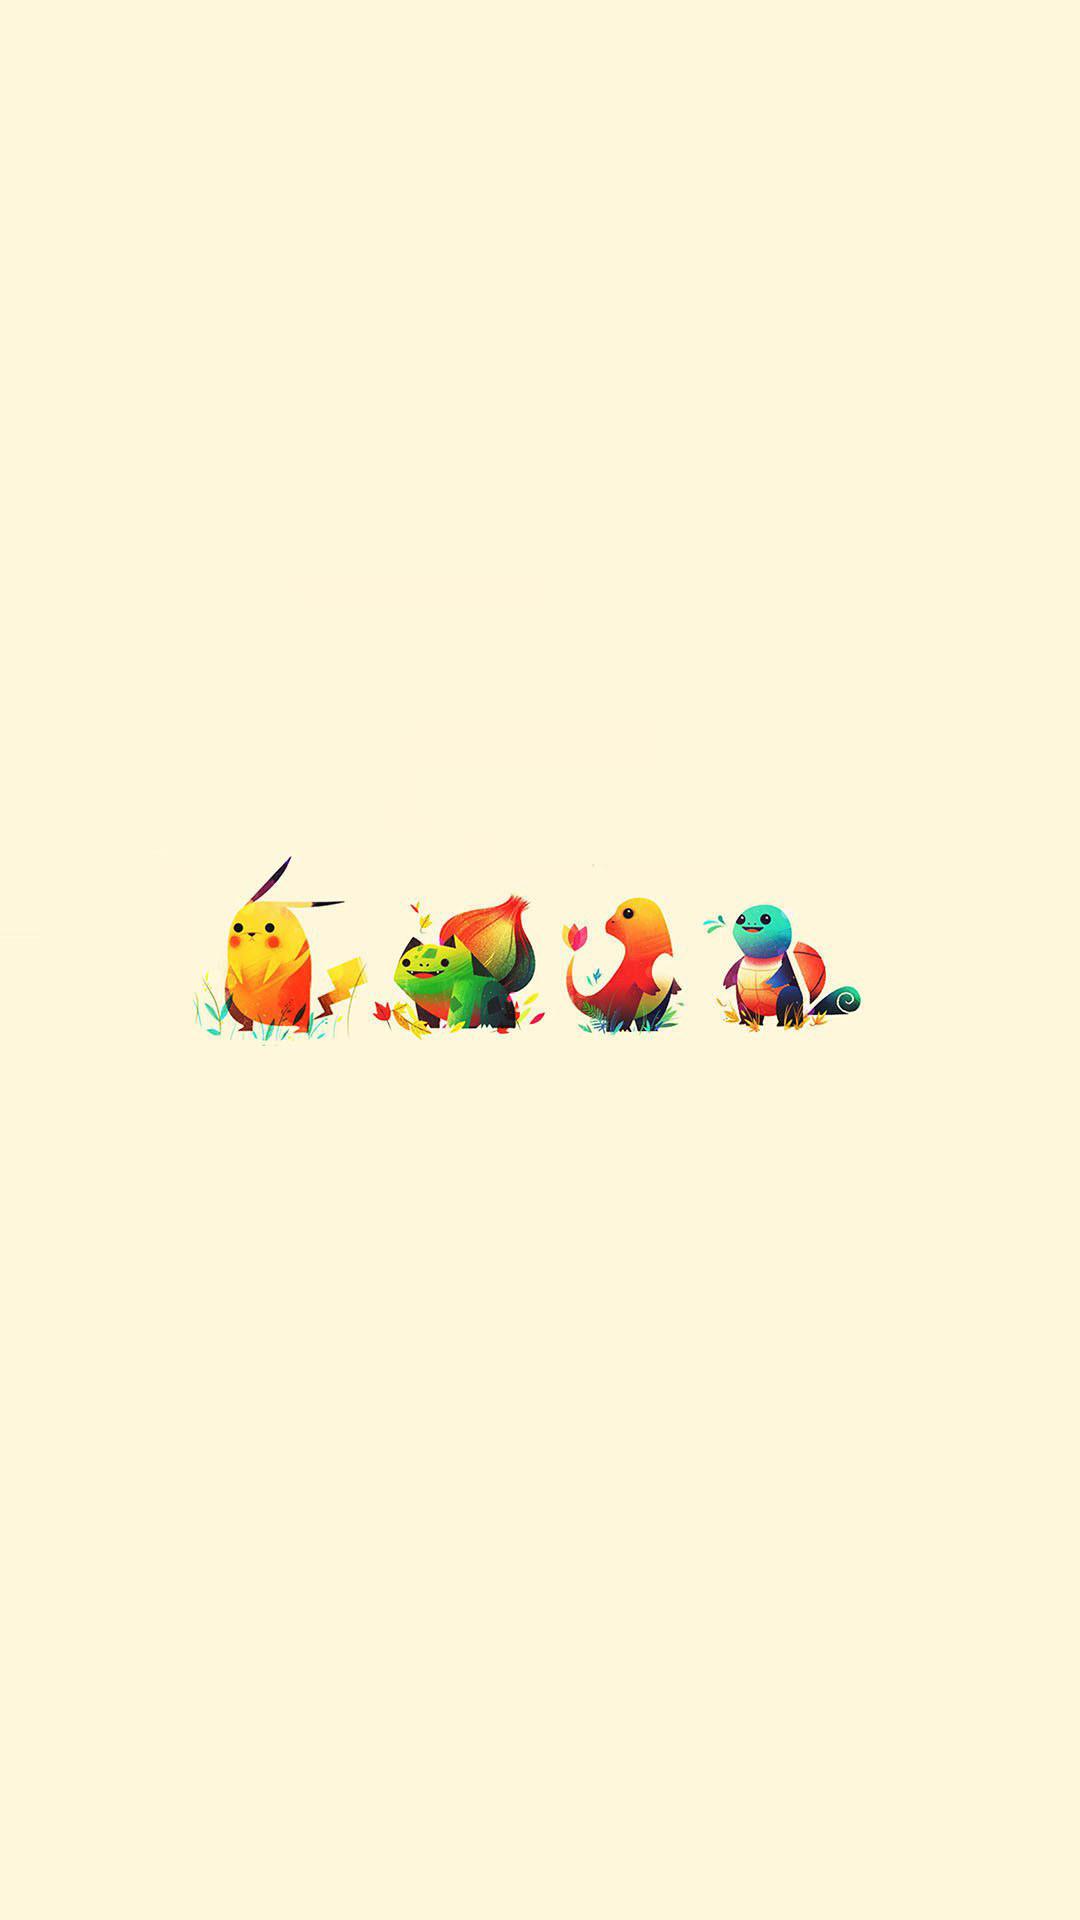 Pokemon Cute Illustration Minimal Android Wallpaper …